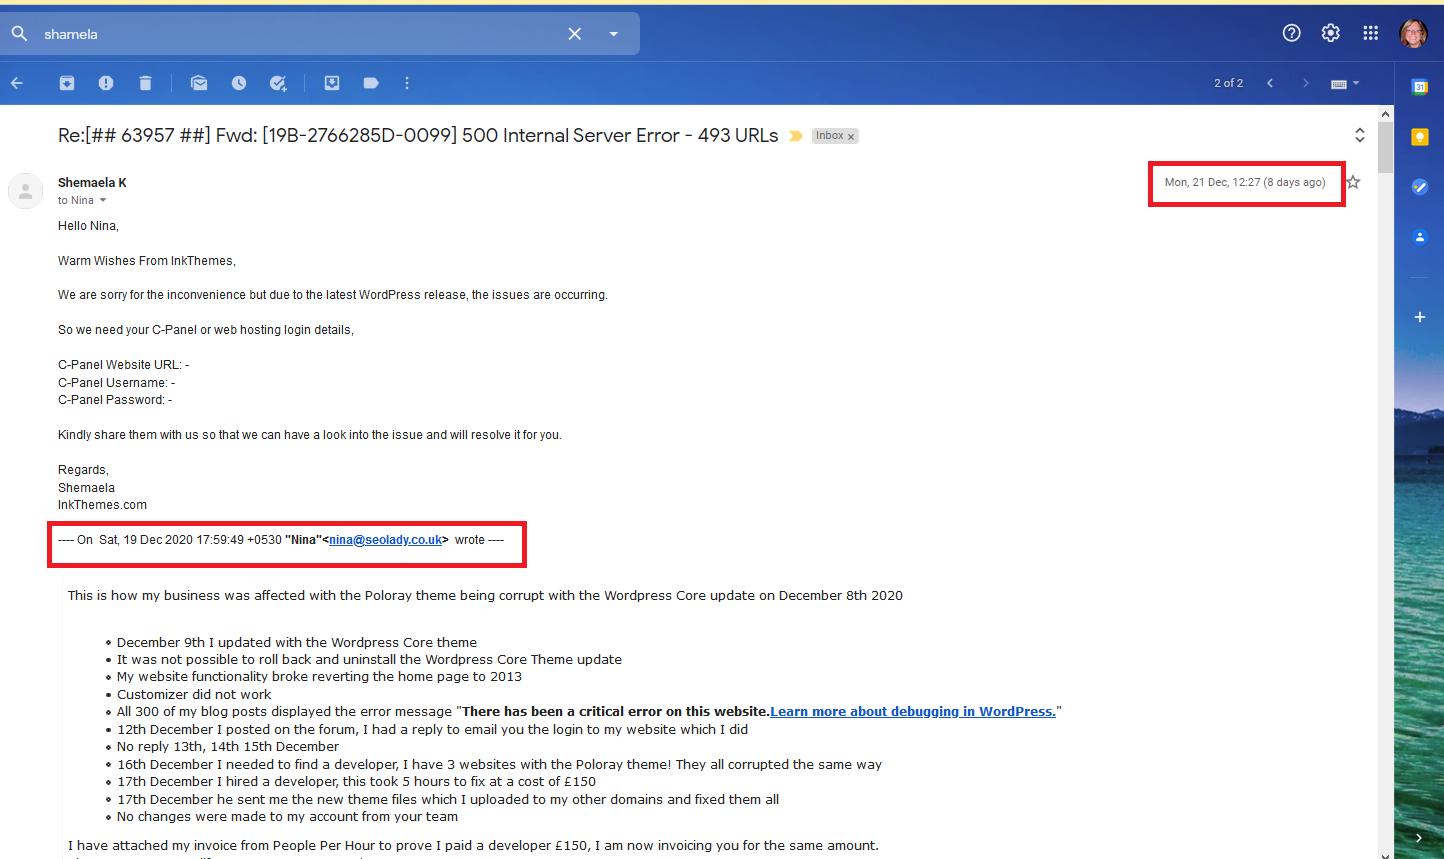 Poloray Wordpress Shamela Developer Theme 2015 Customizer Broken Not Working Core Update December 2020